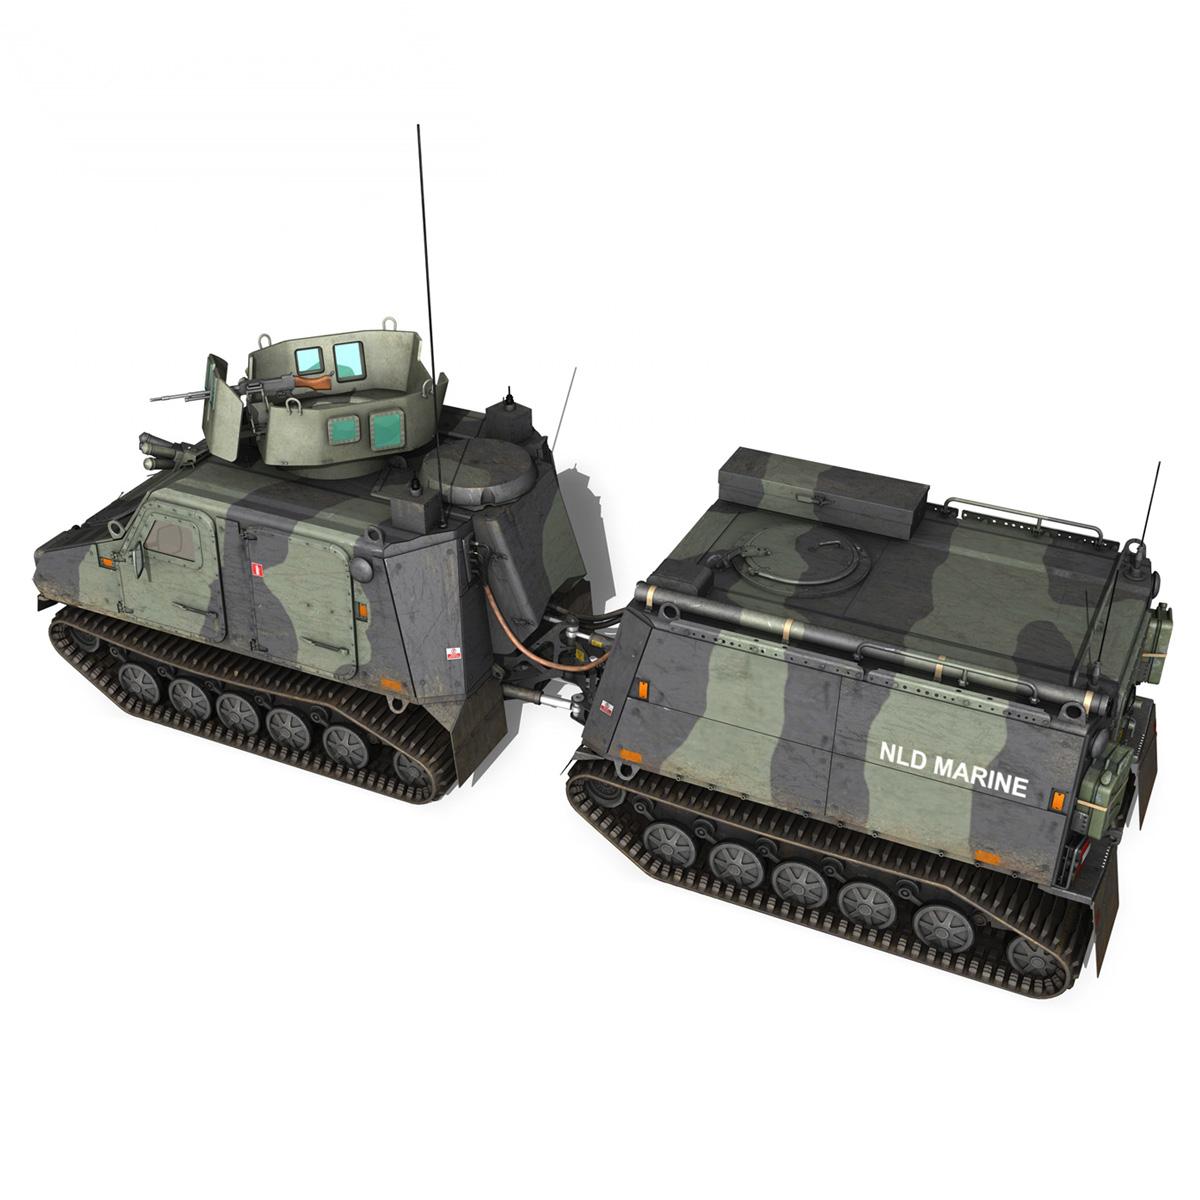 bvs10 viking – netherlands marine corps 3d model 3ds c4d lwo obj 293518